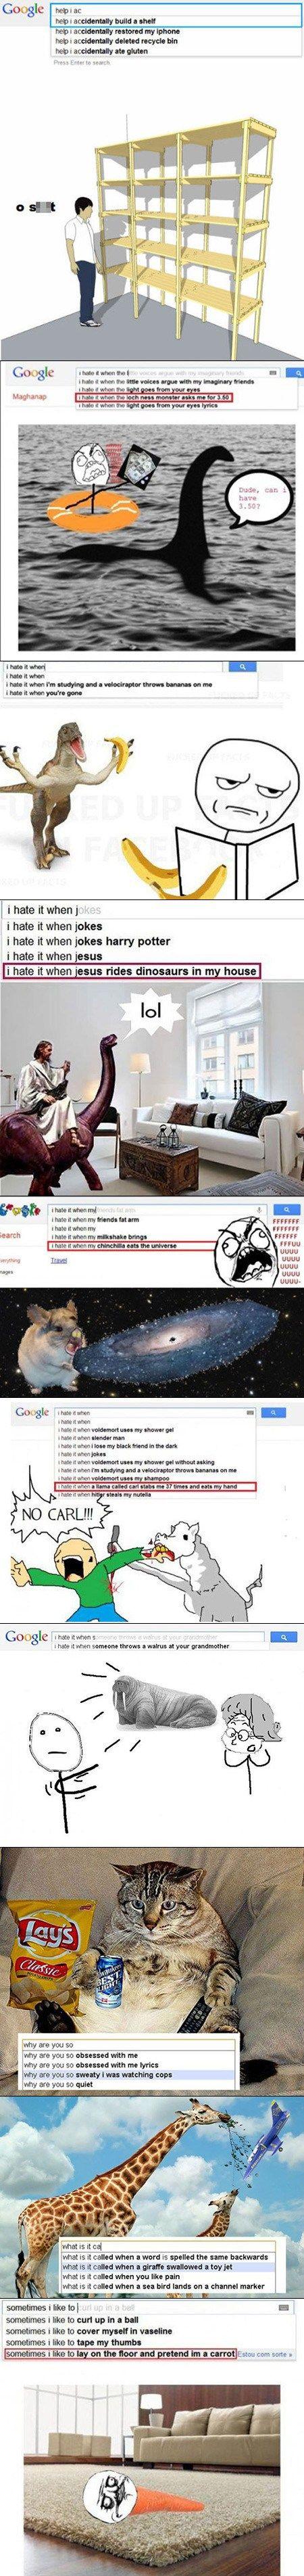 weird google searches